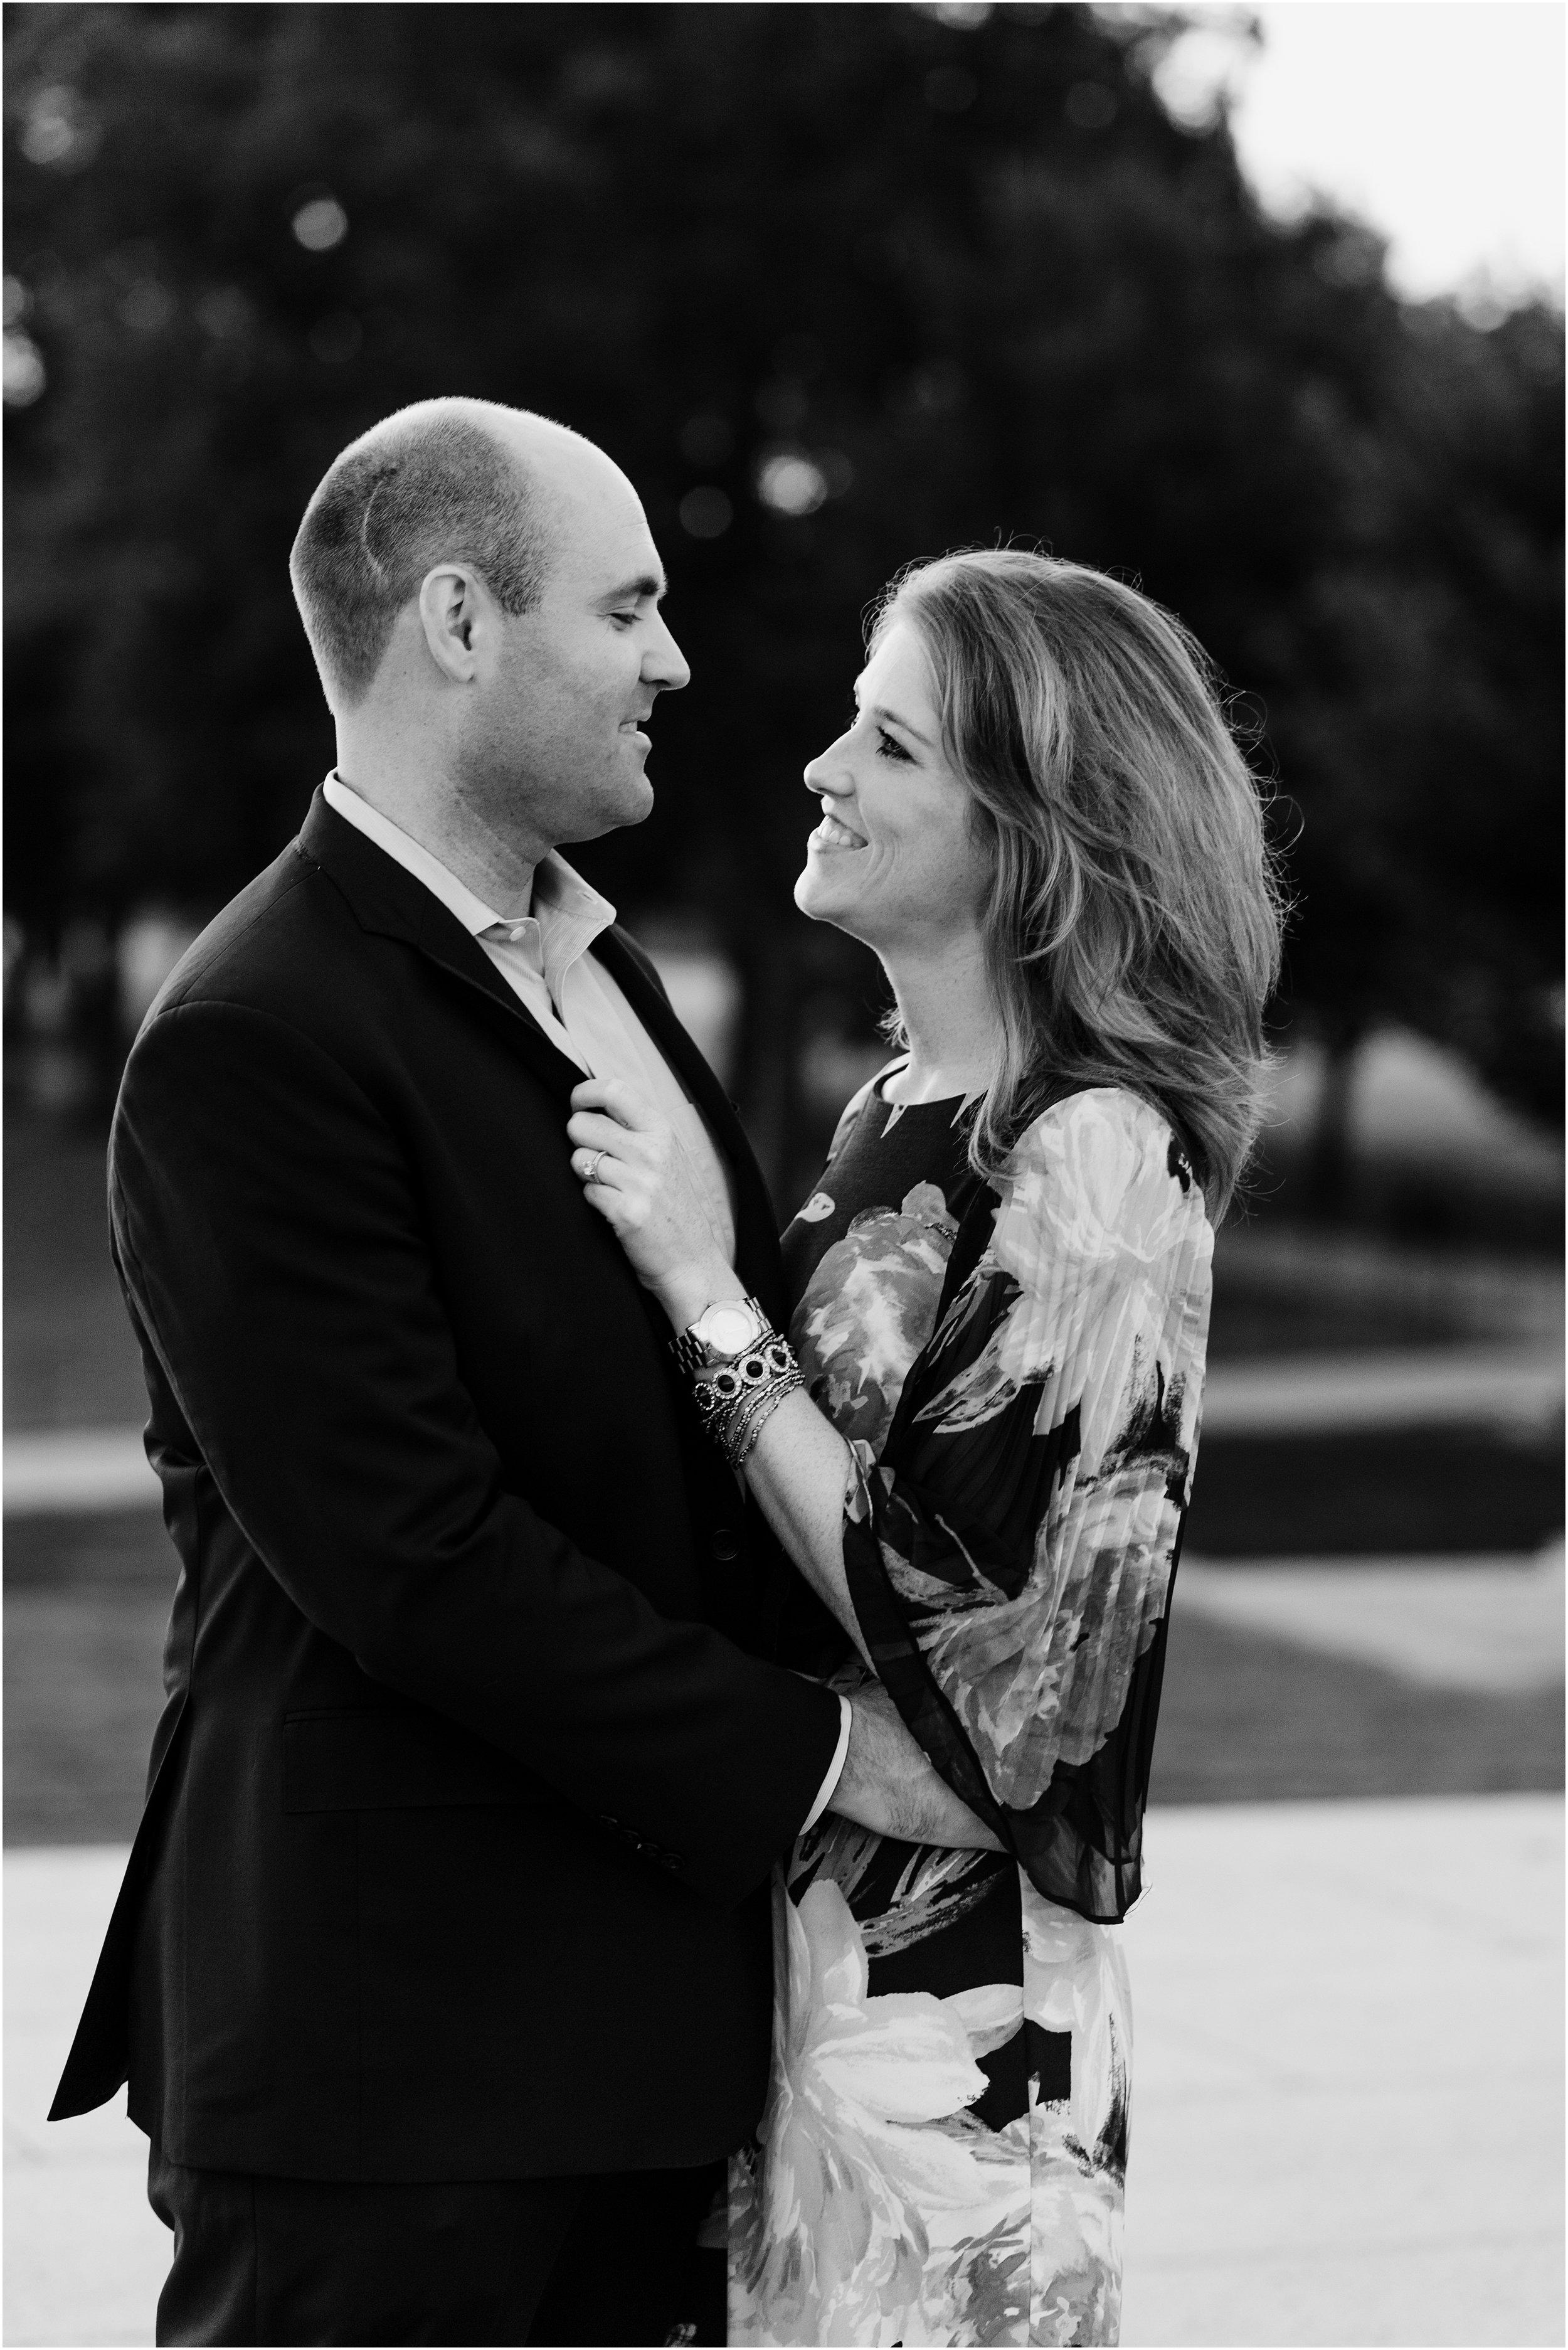 hannah leigh photography Sunrise Jefferson Memorial Engagement Session, Washington DC_1025.jpg